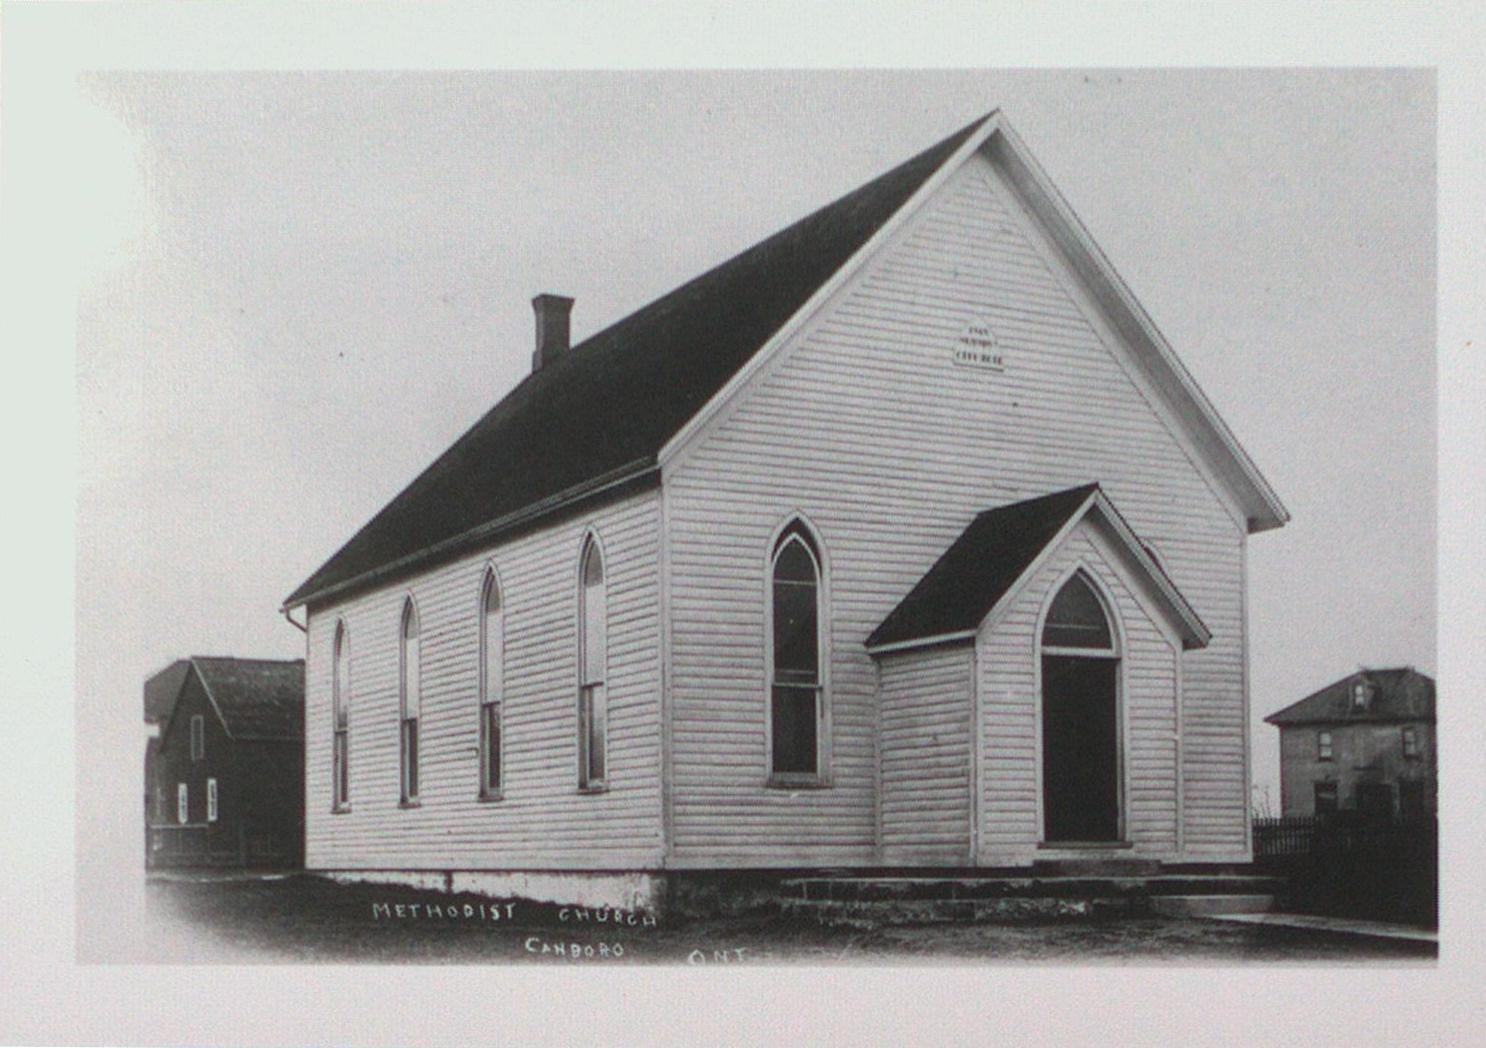 The Methodist Church, Canboro